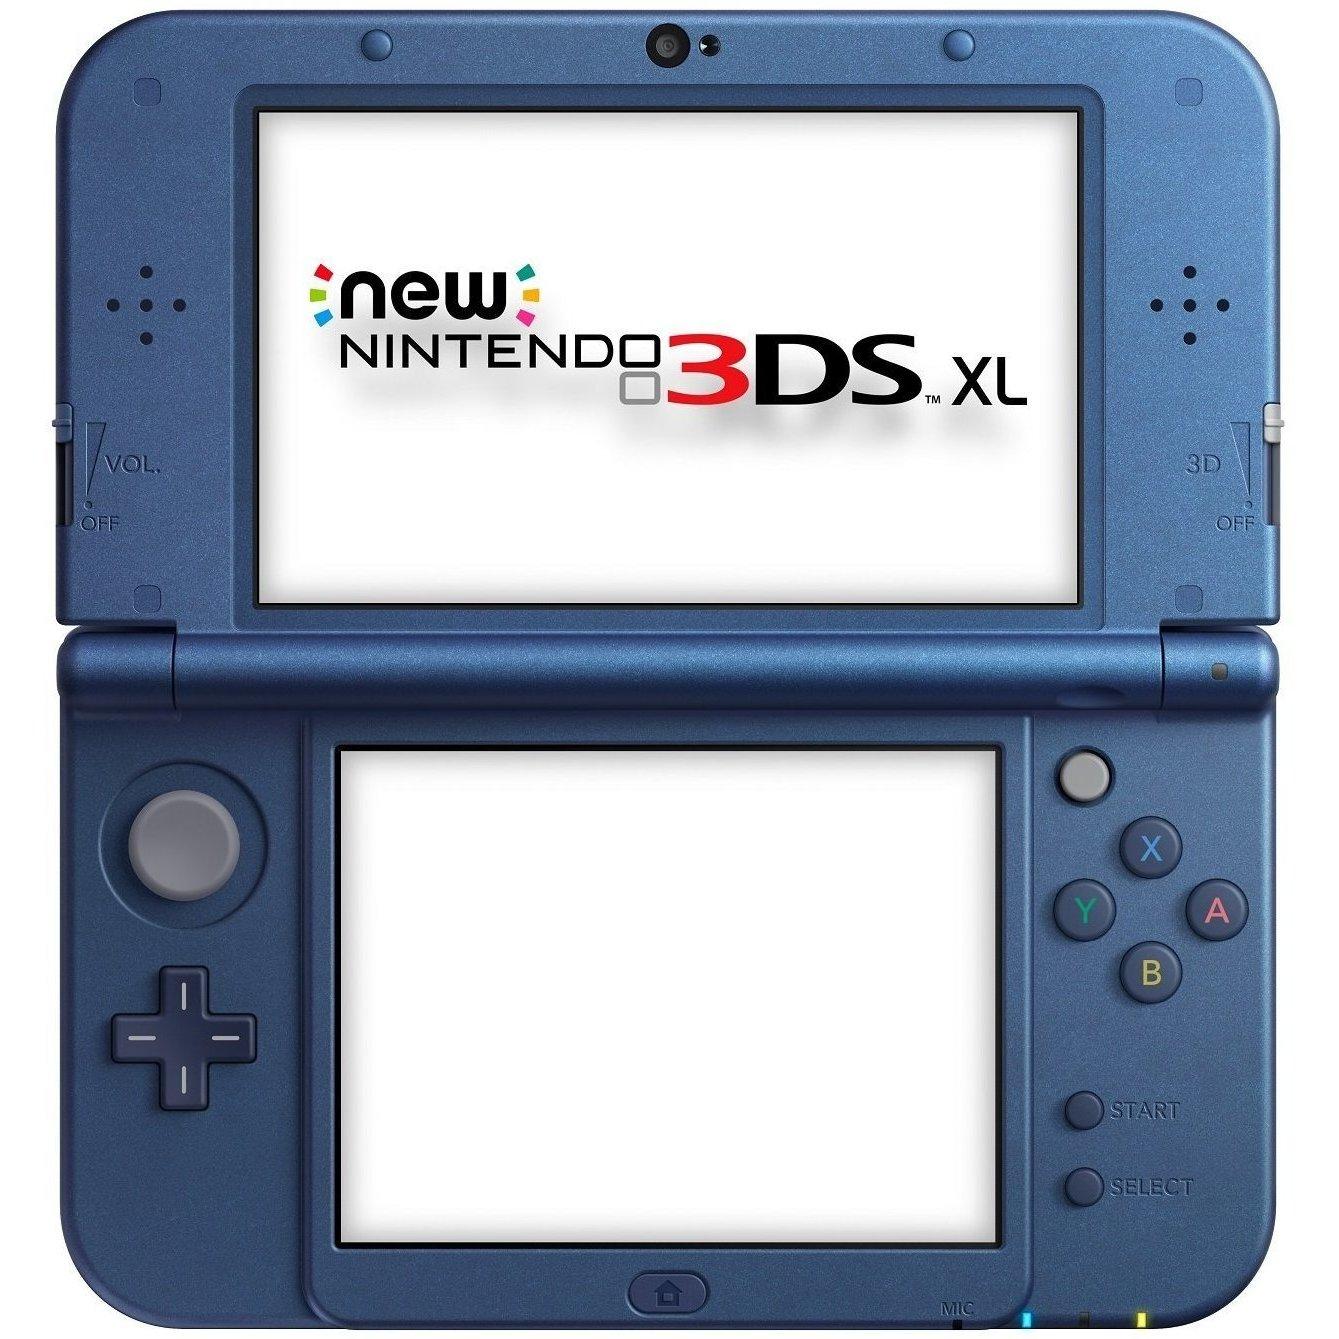 Nintendo 3DS XL Handheld Gaming System (2015 Version, Galaxy REDSUBAA